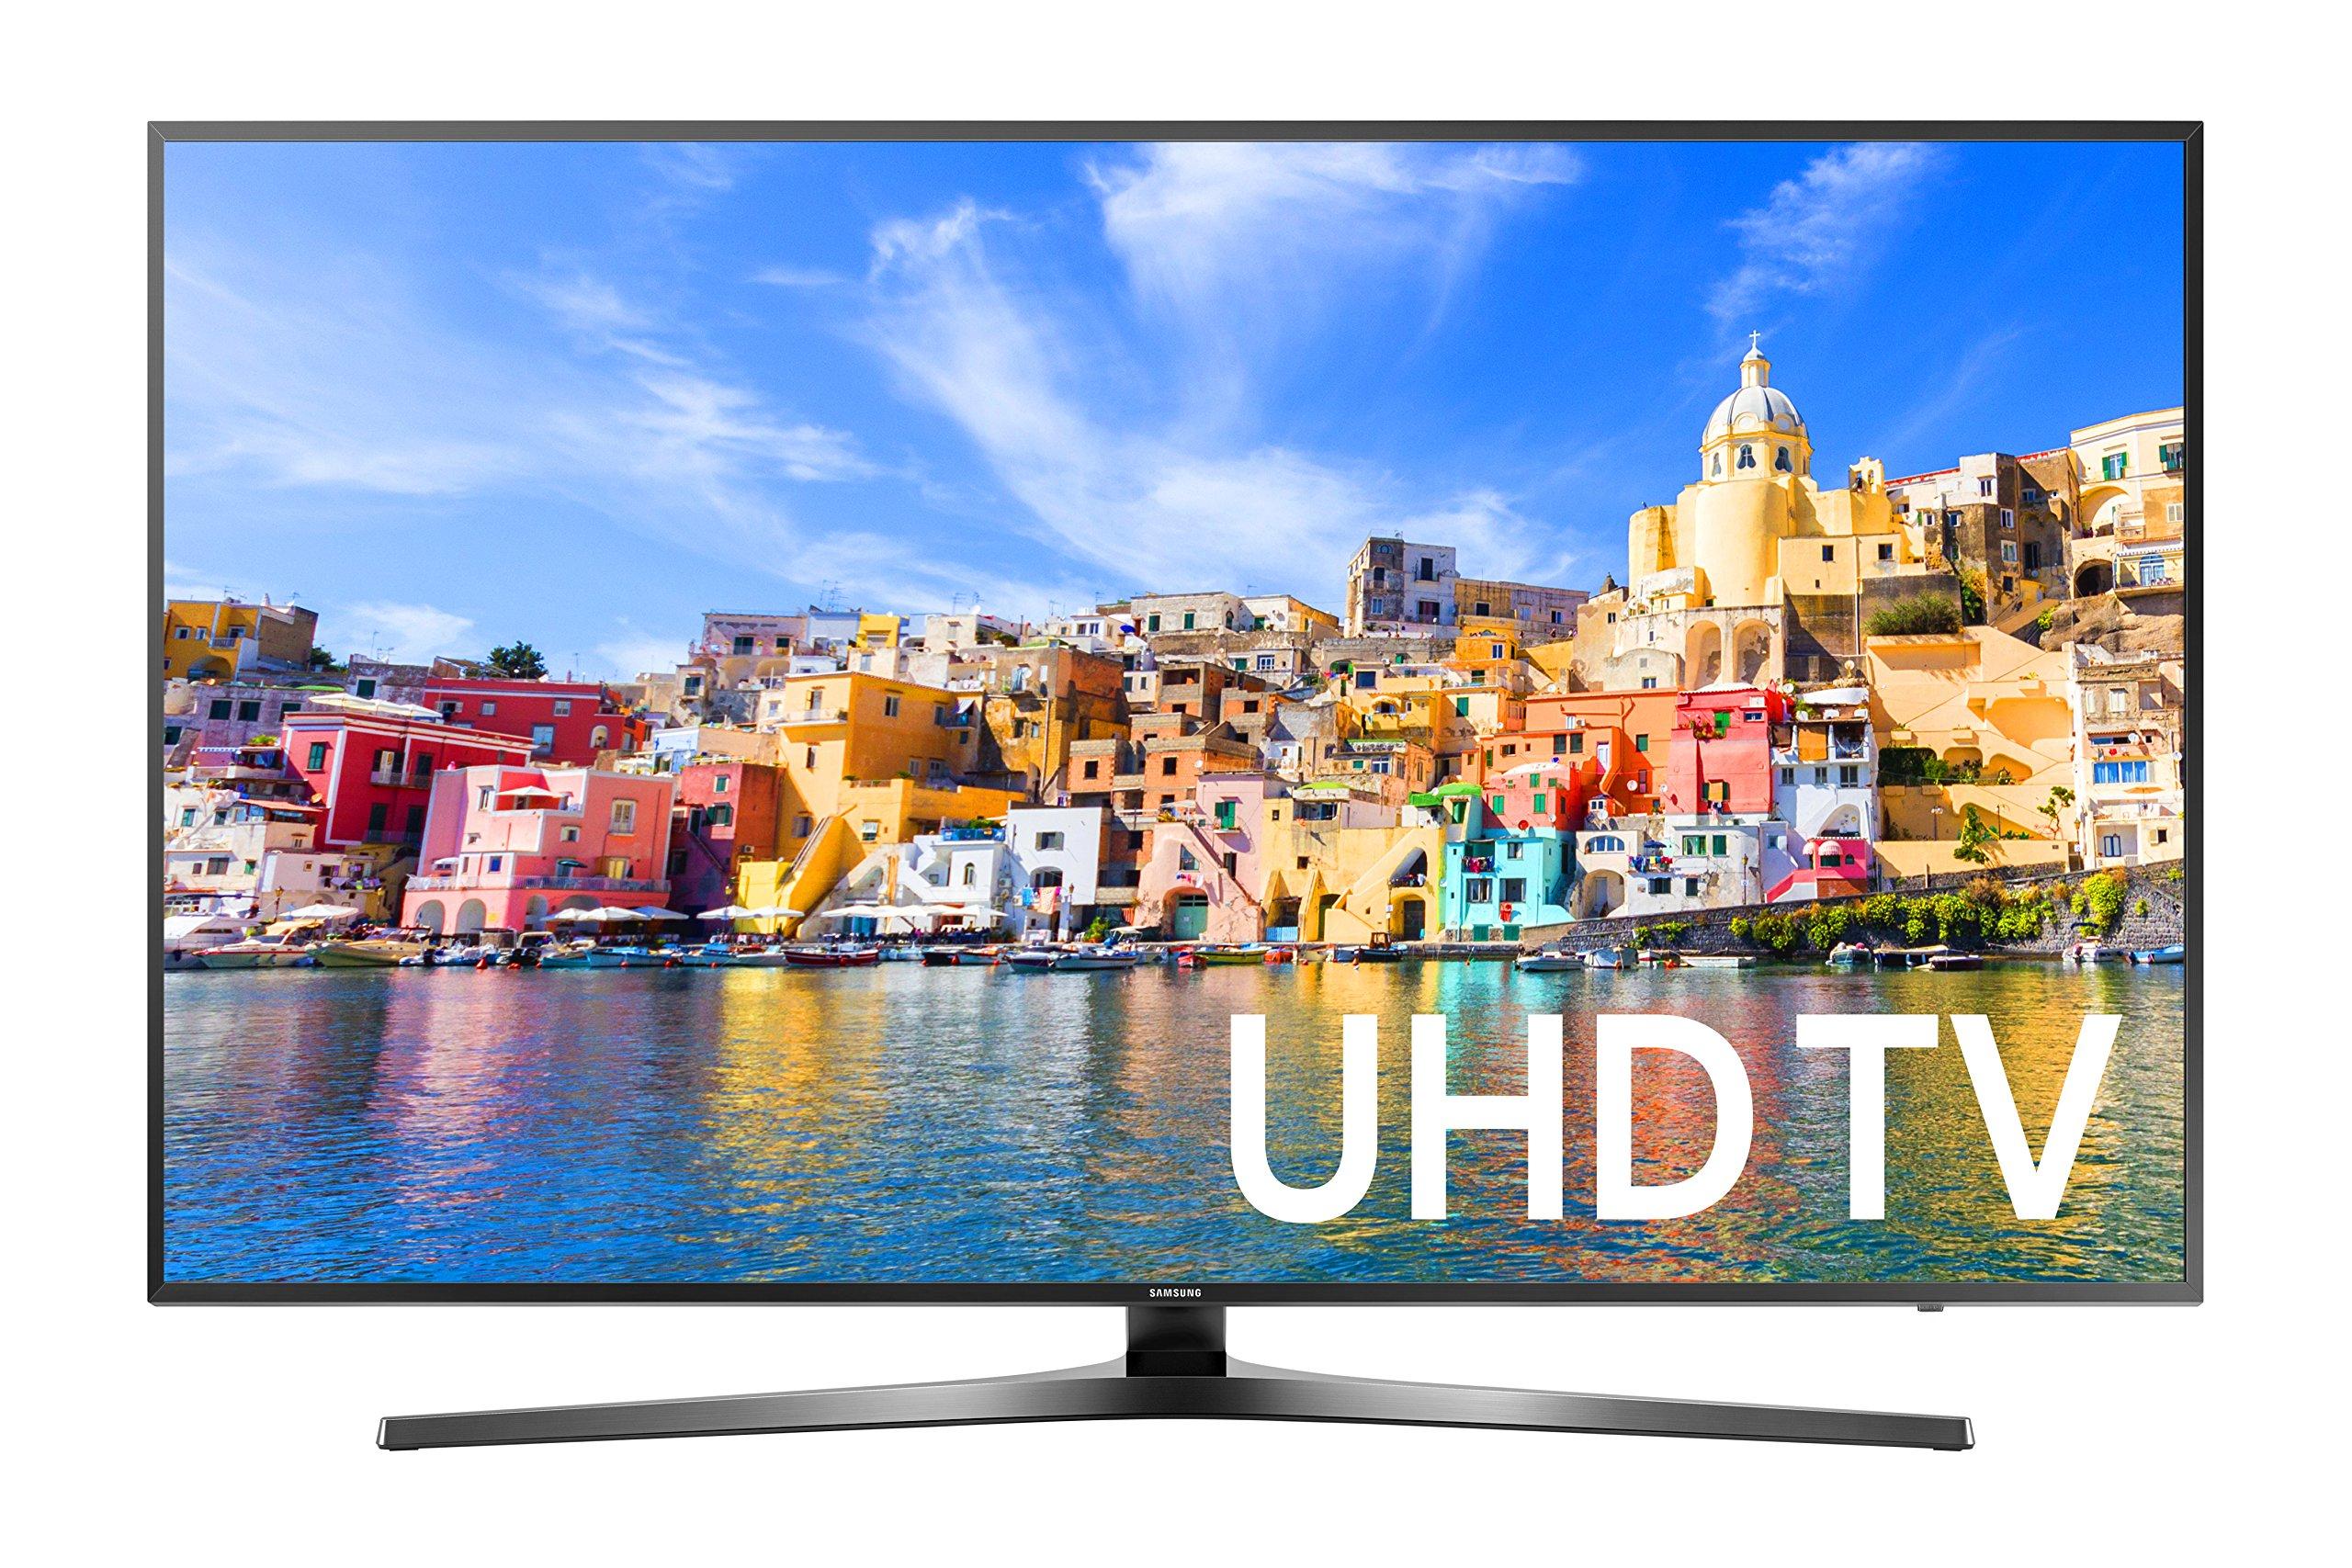 Samsung Curved 4K Ultra HD Smart LED TV3 de 55 Pulgadas: Amazon.es: Electrónica